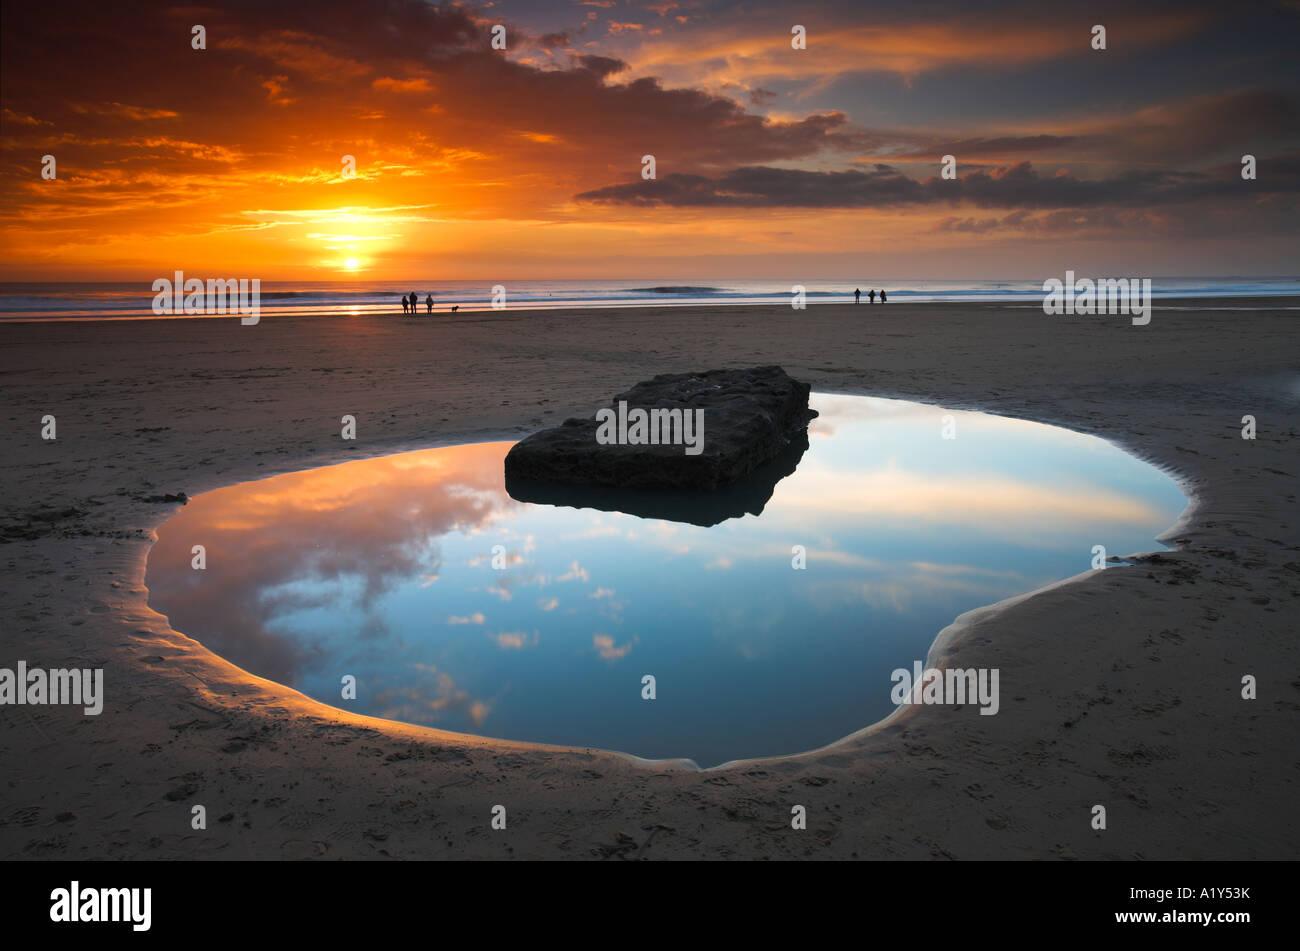 Dunraven Bay Rockpool und Menschen bei Sonnenuntergang, Southerndown, Wales Stockbild